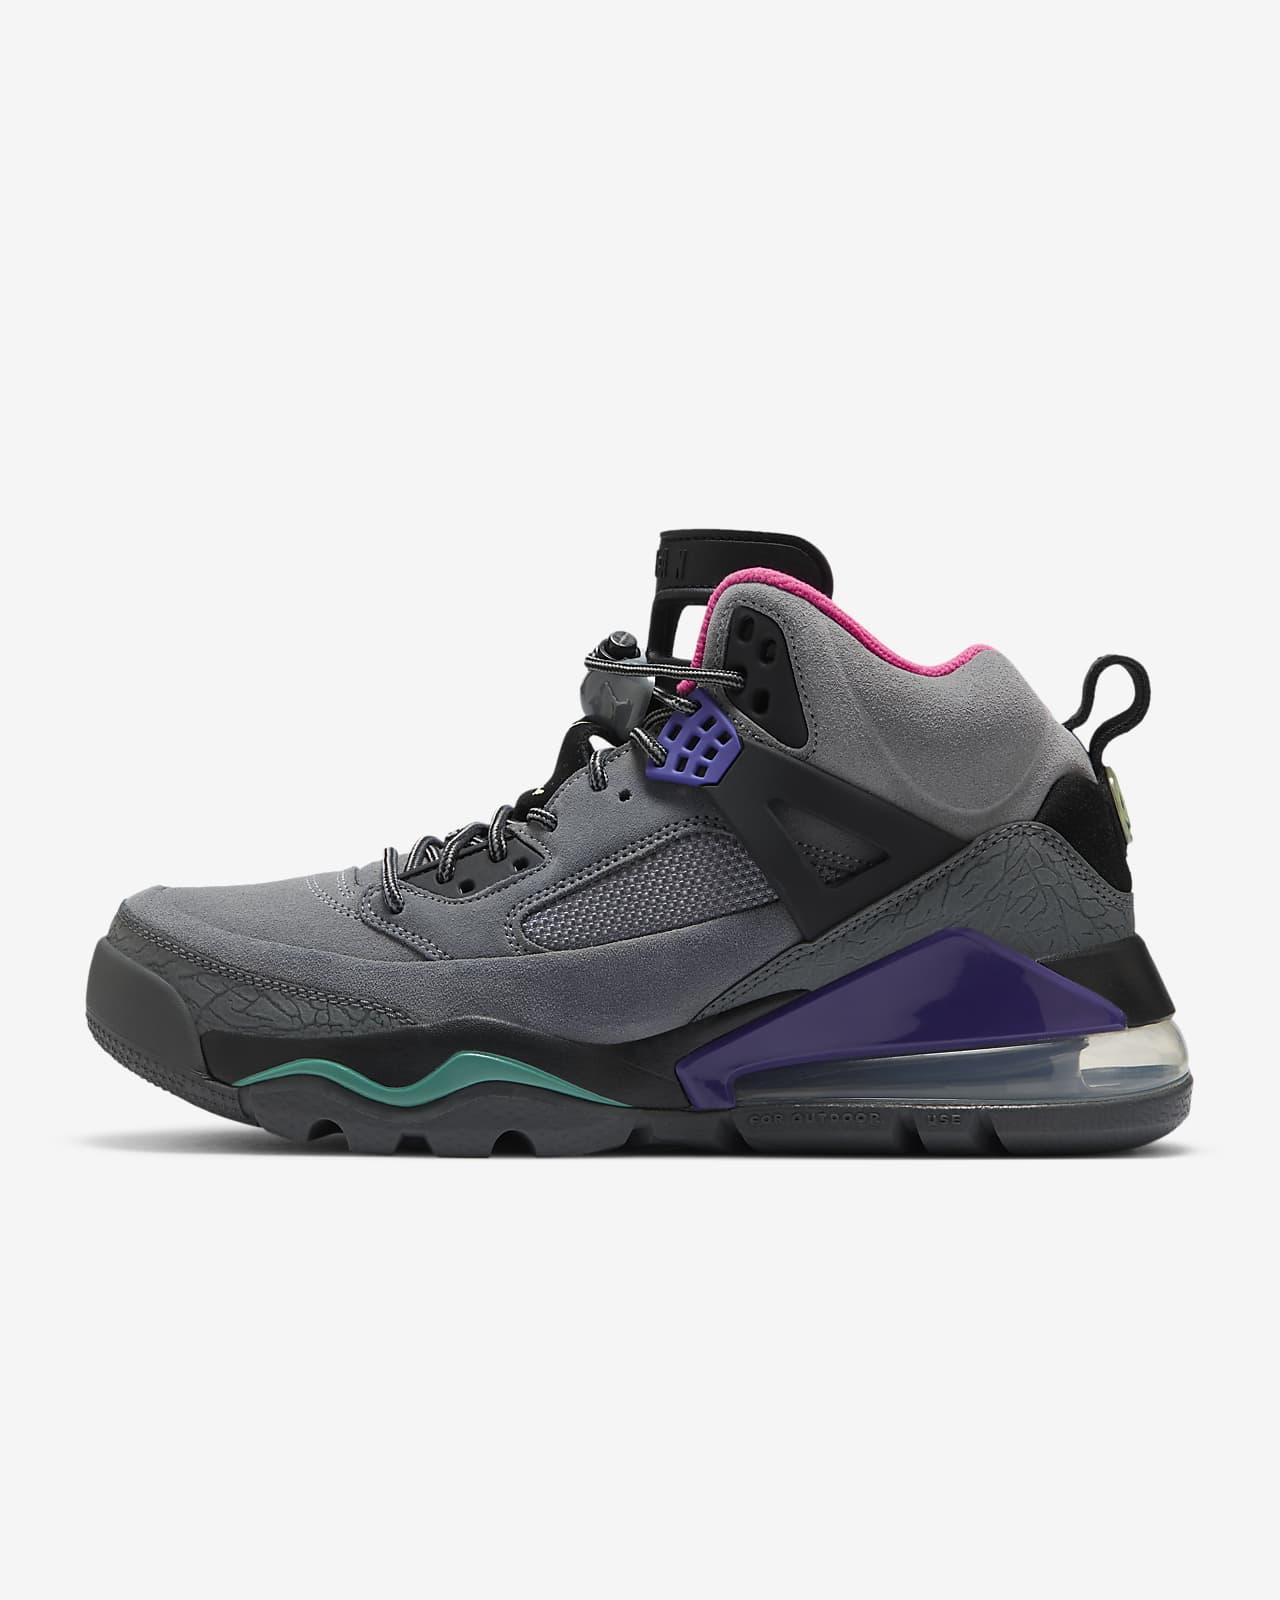 Jordan Spizike 270 Boot 男子运动鞋